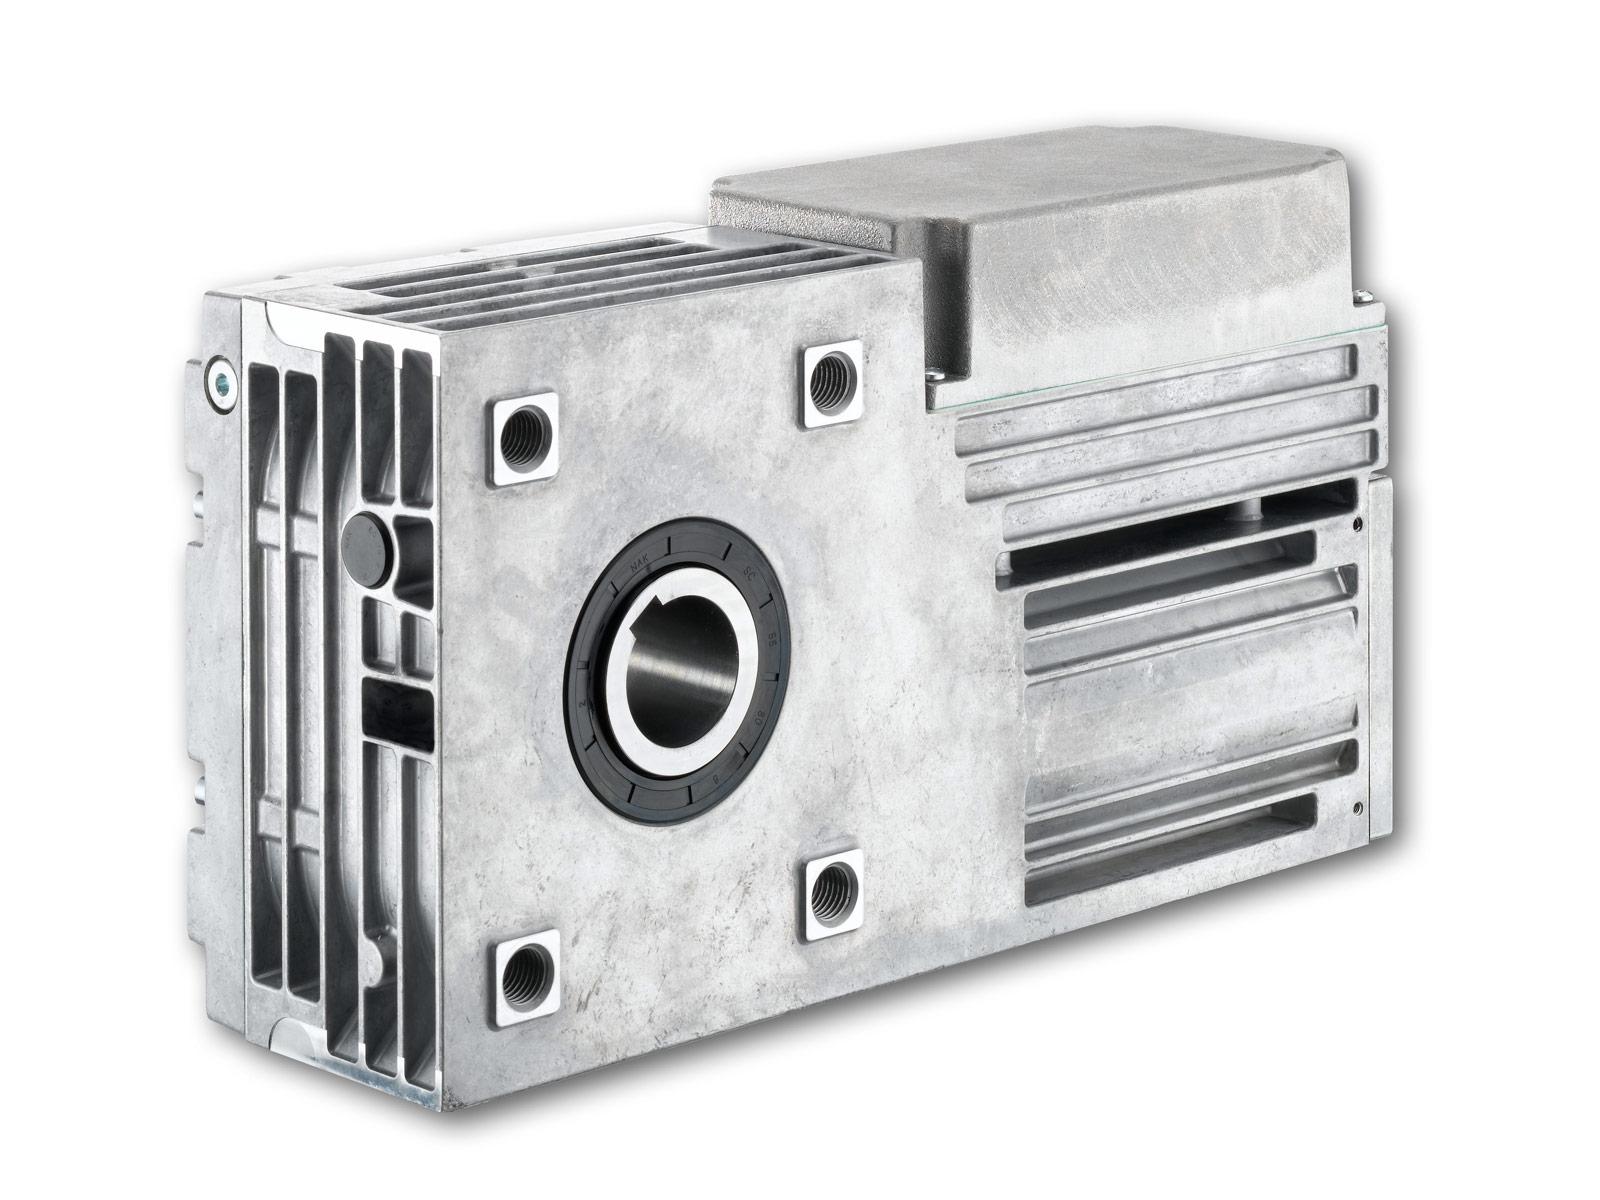 Slip-on geared motor Compacta AG160